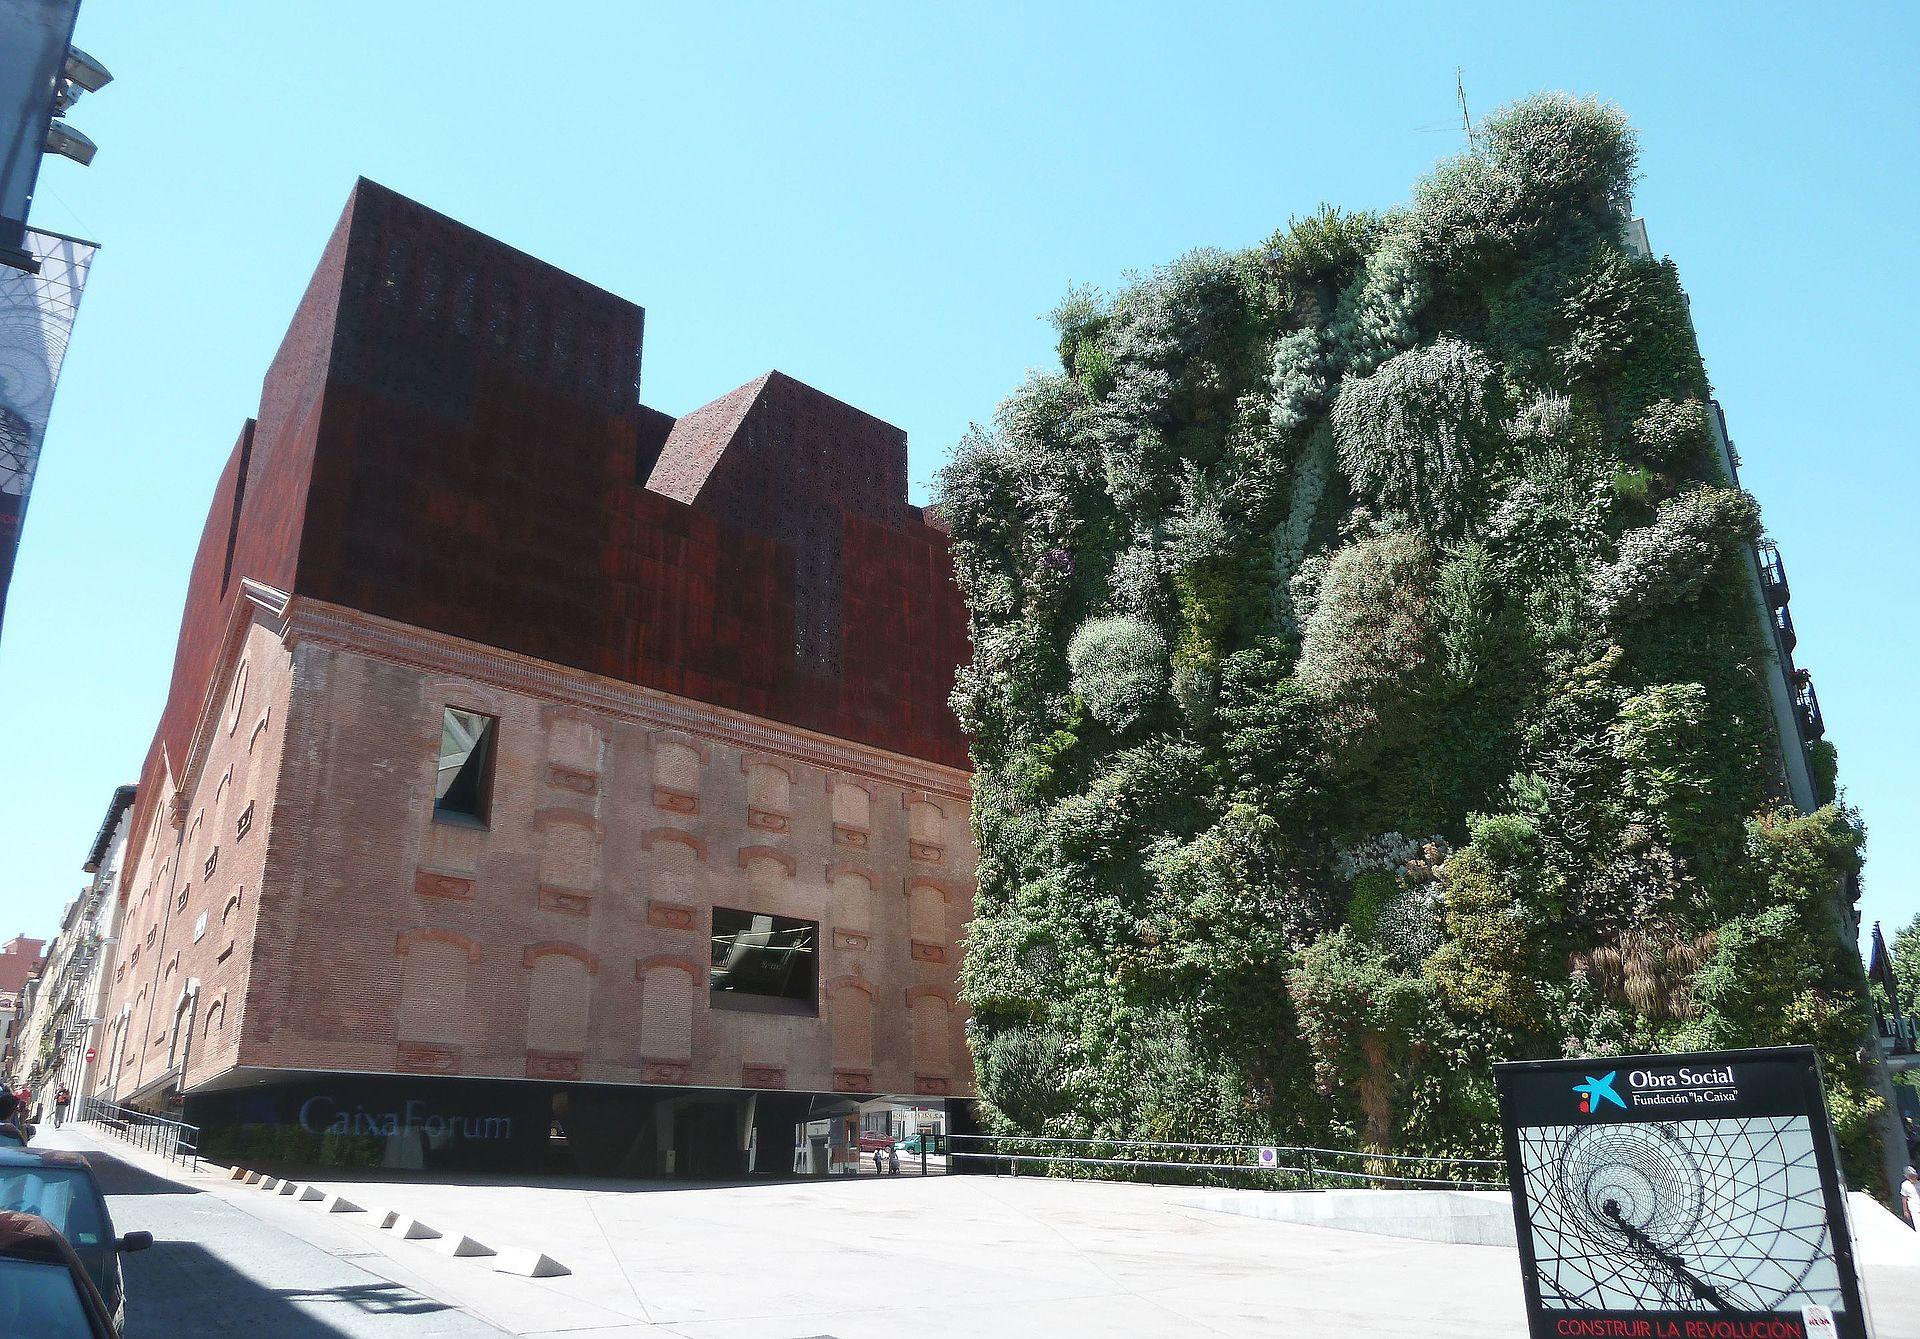 1920px-CaixaForum_Madrid_(Espa%C3%B1a)_0